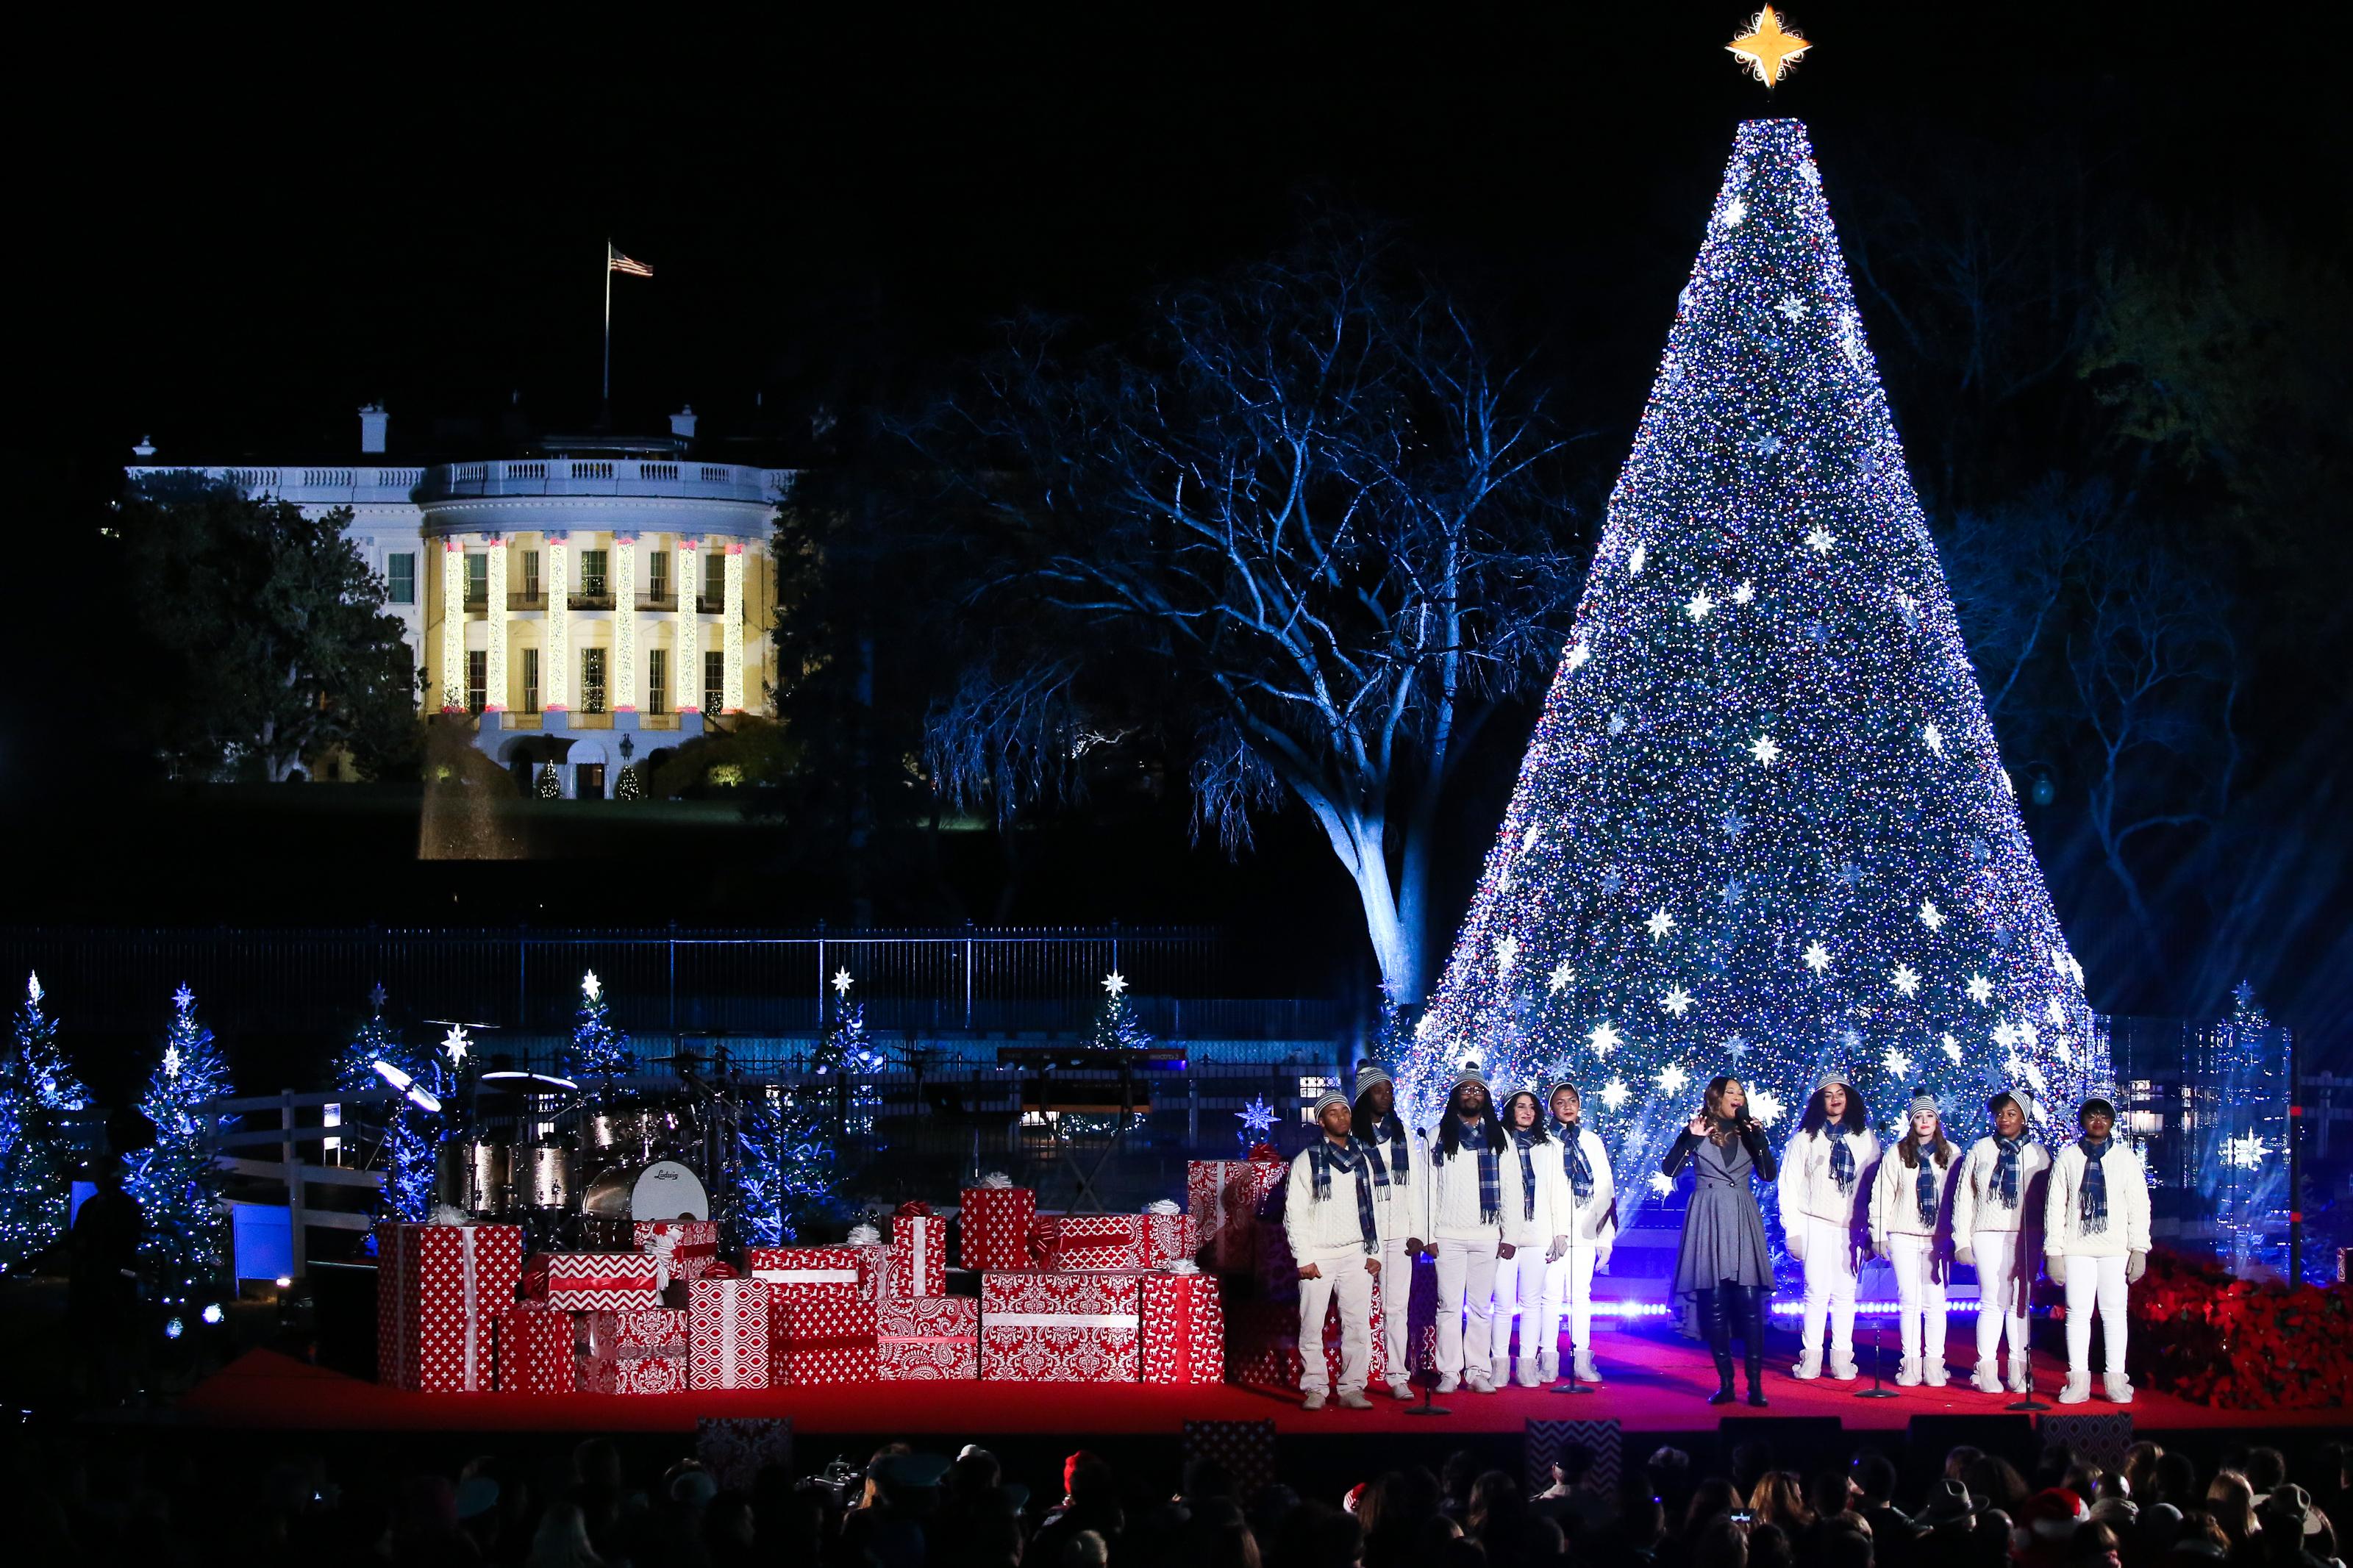 photo credit 2016 national christmas tree lighting at presidents parkpaul morigi for the